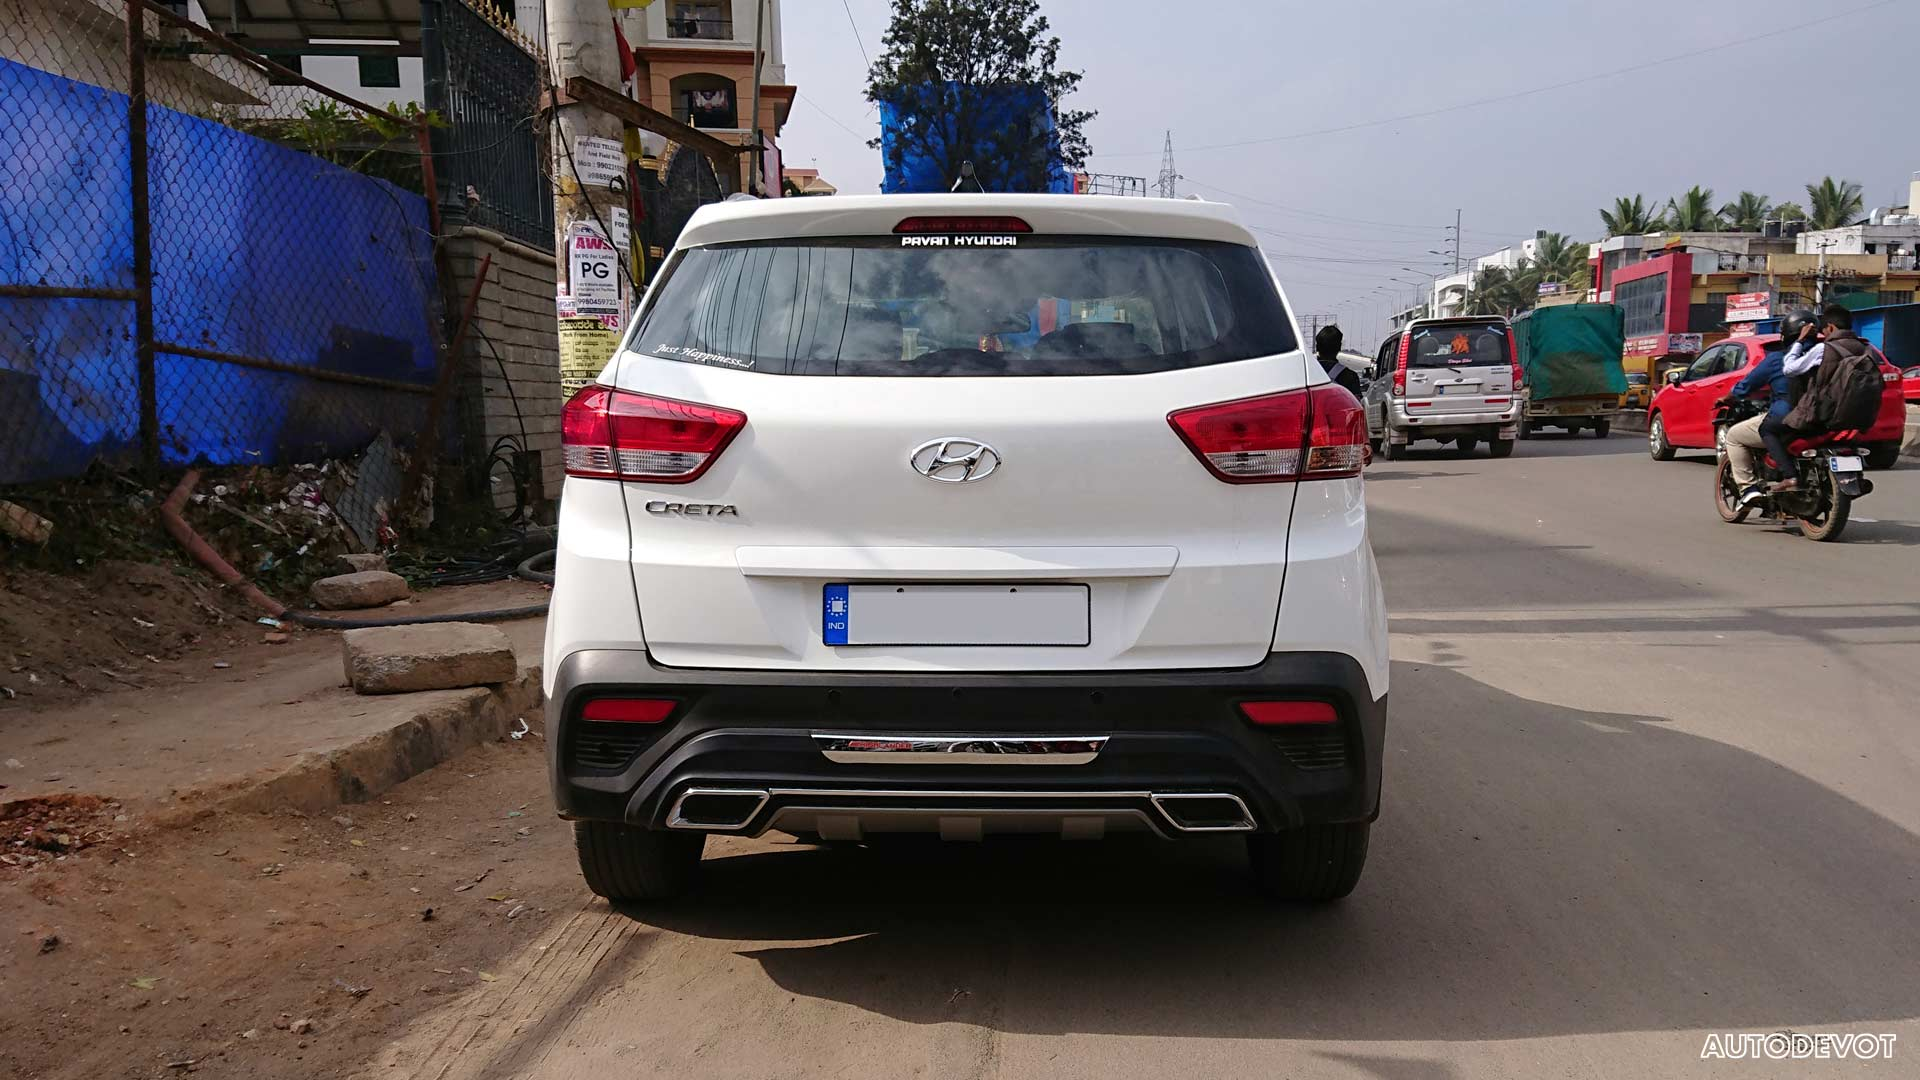 Hyundai-Creta-with-fake-exhaust-India